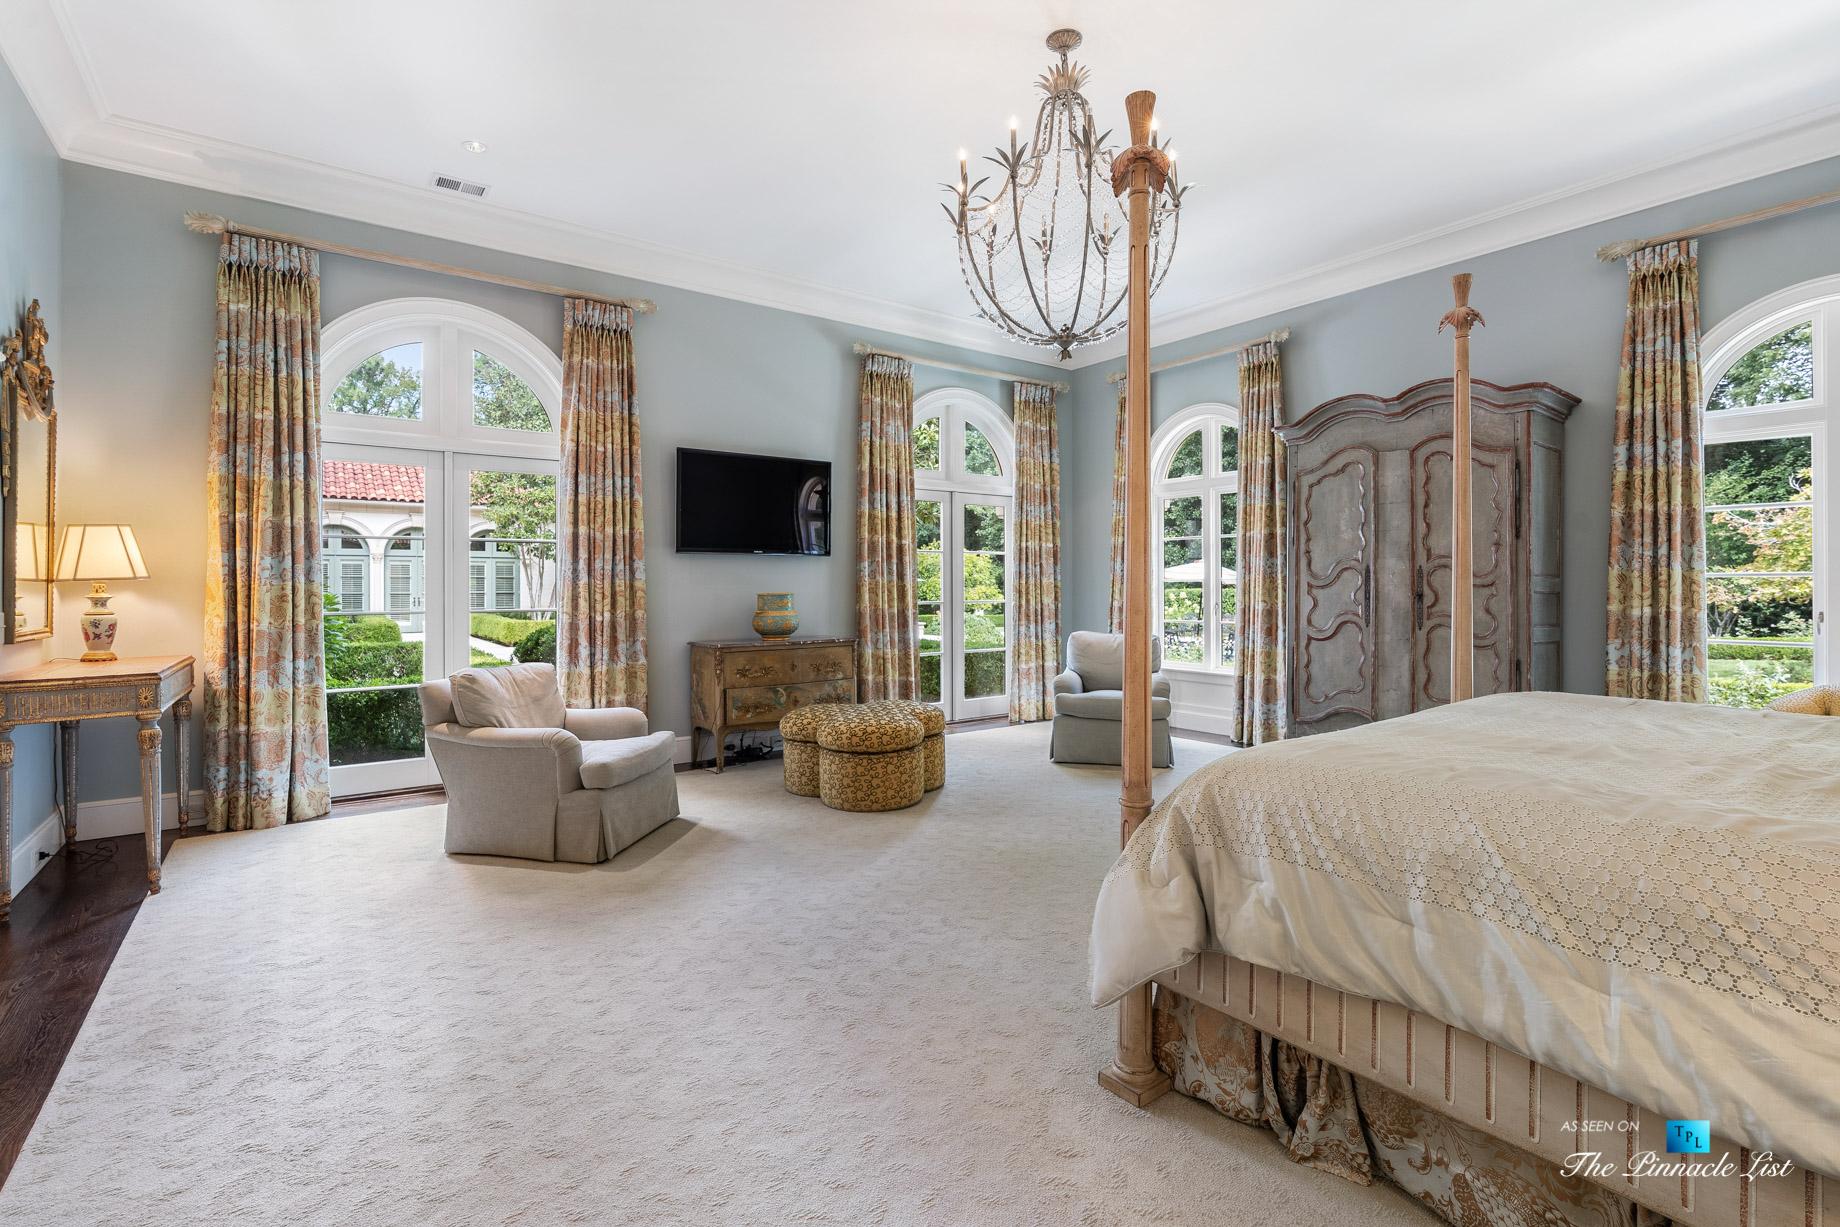 439 Blackland Rd NW, Atlanta, GA, USA - Master Bedroom - Luxury Real Estate - Tuxedo Park Mediterranean Mansion Home